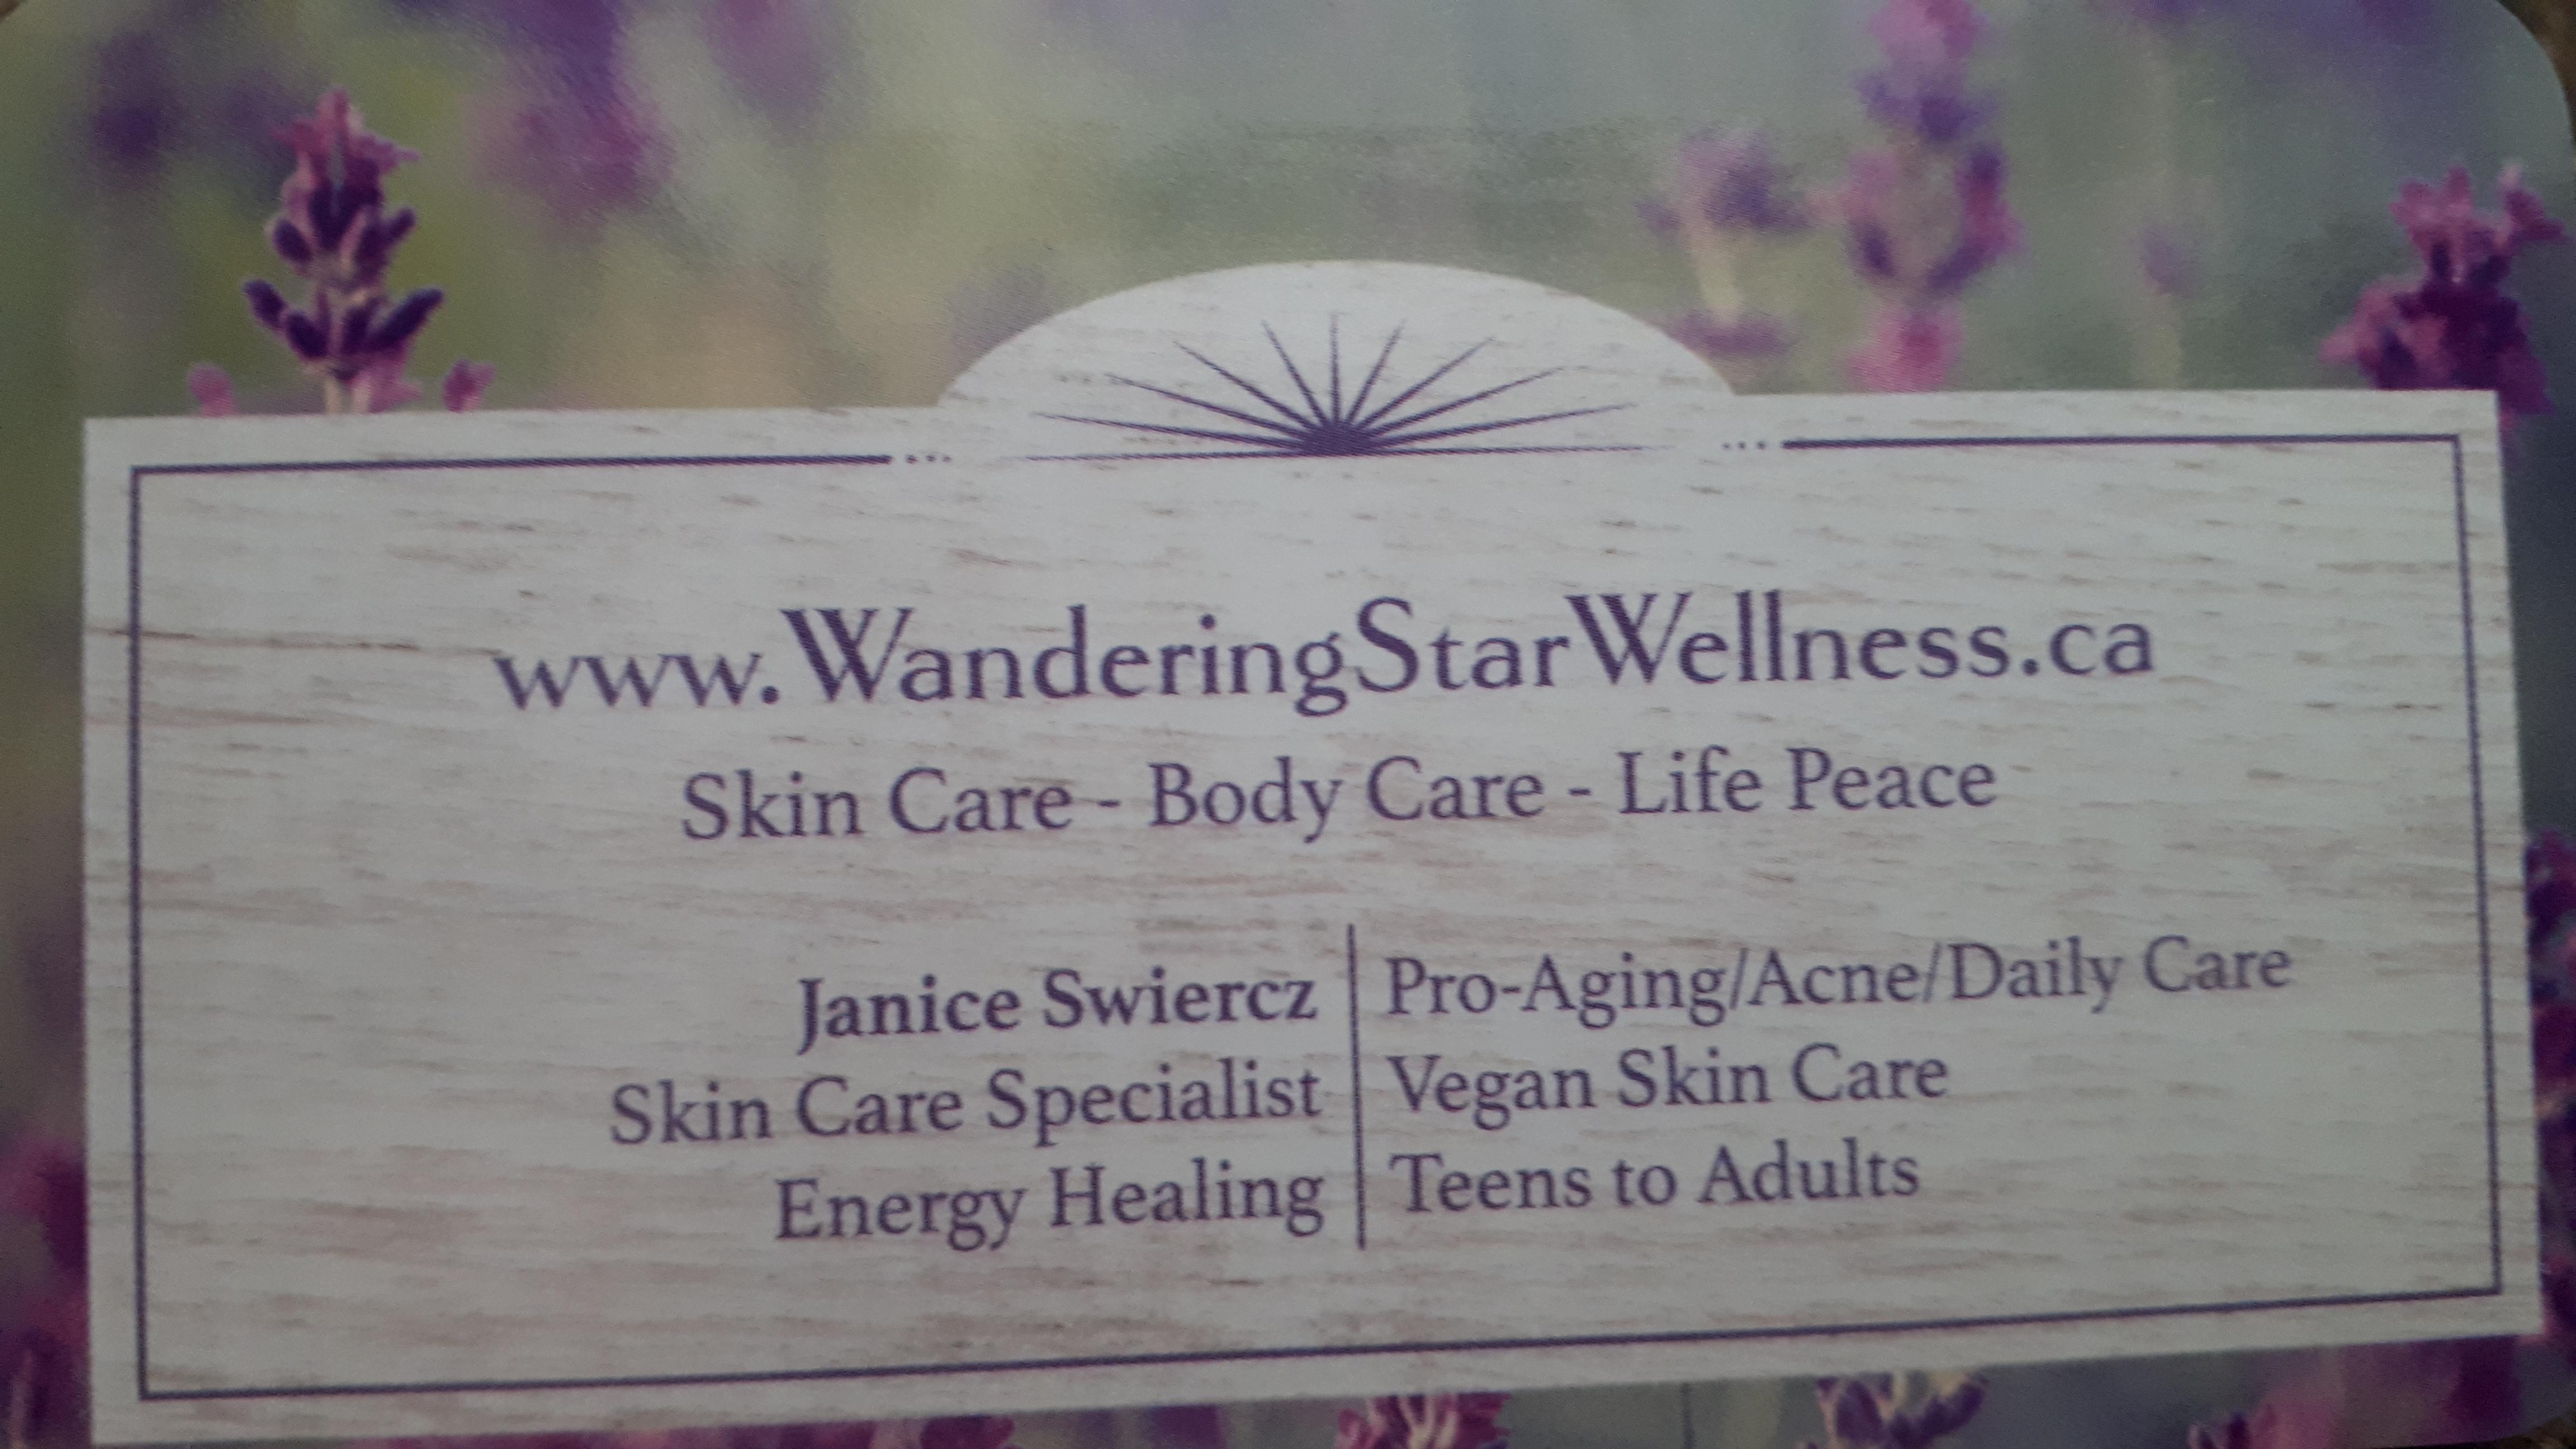 Wandering Star Wellness